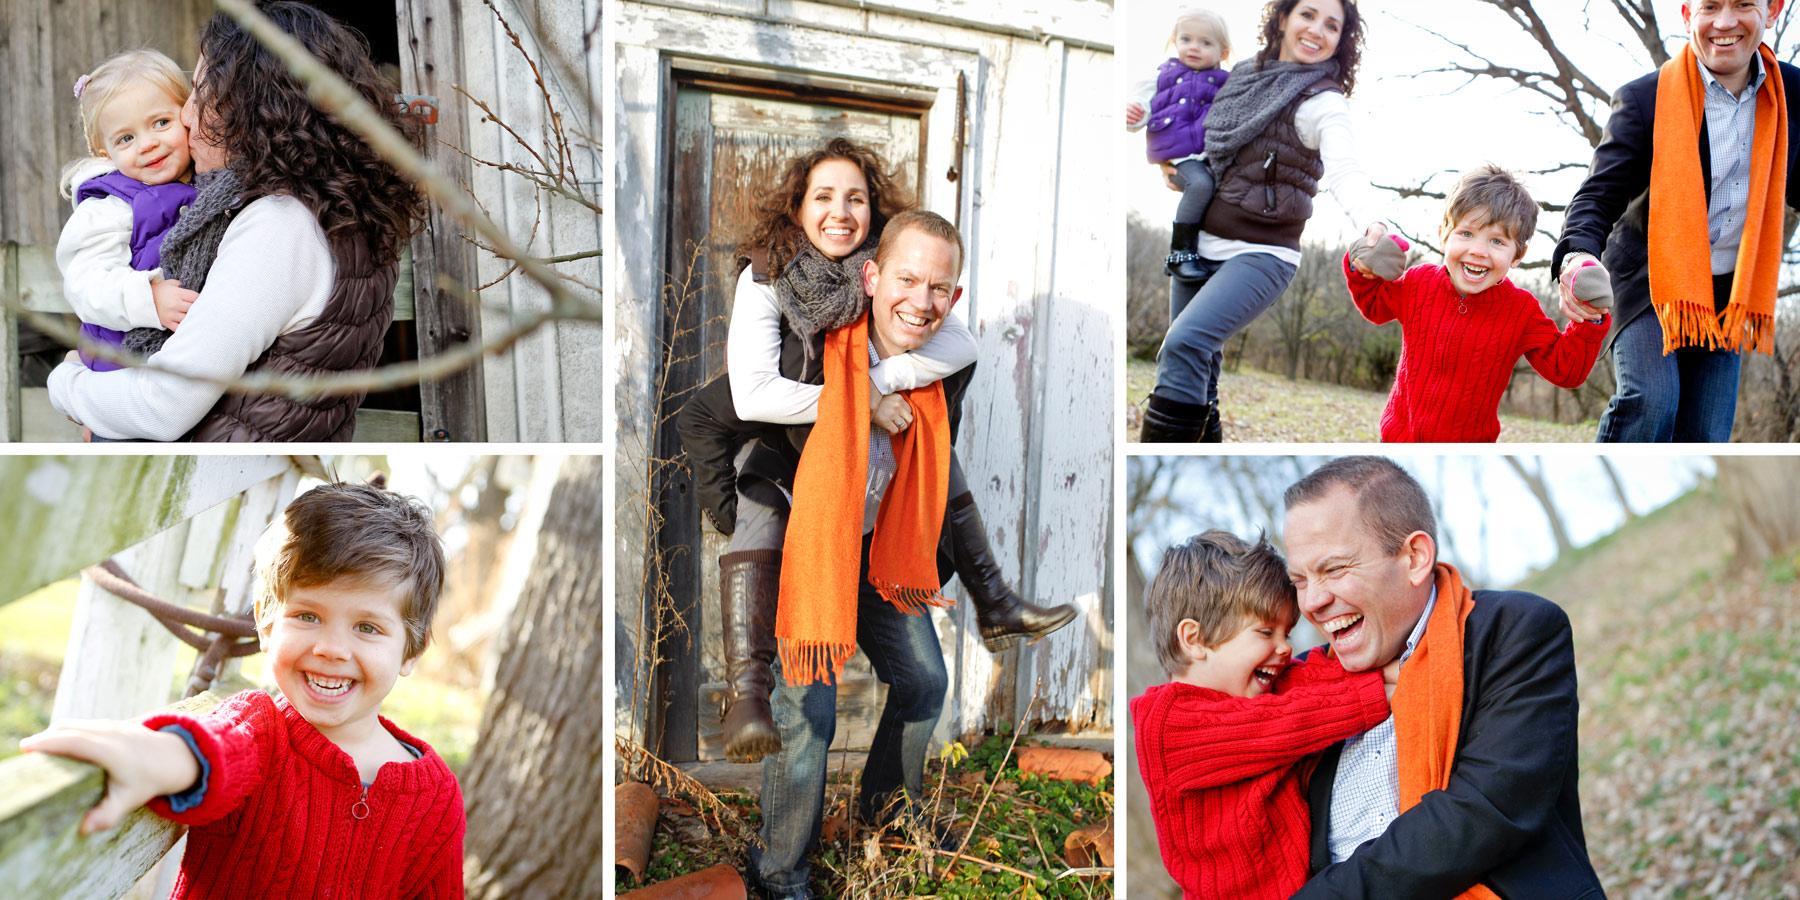 barrington-geneva-st-charles-family-portrait-ruthie-hauge-photography.jpg